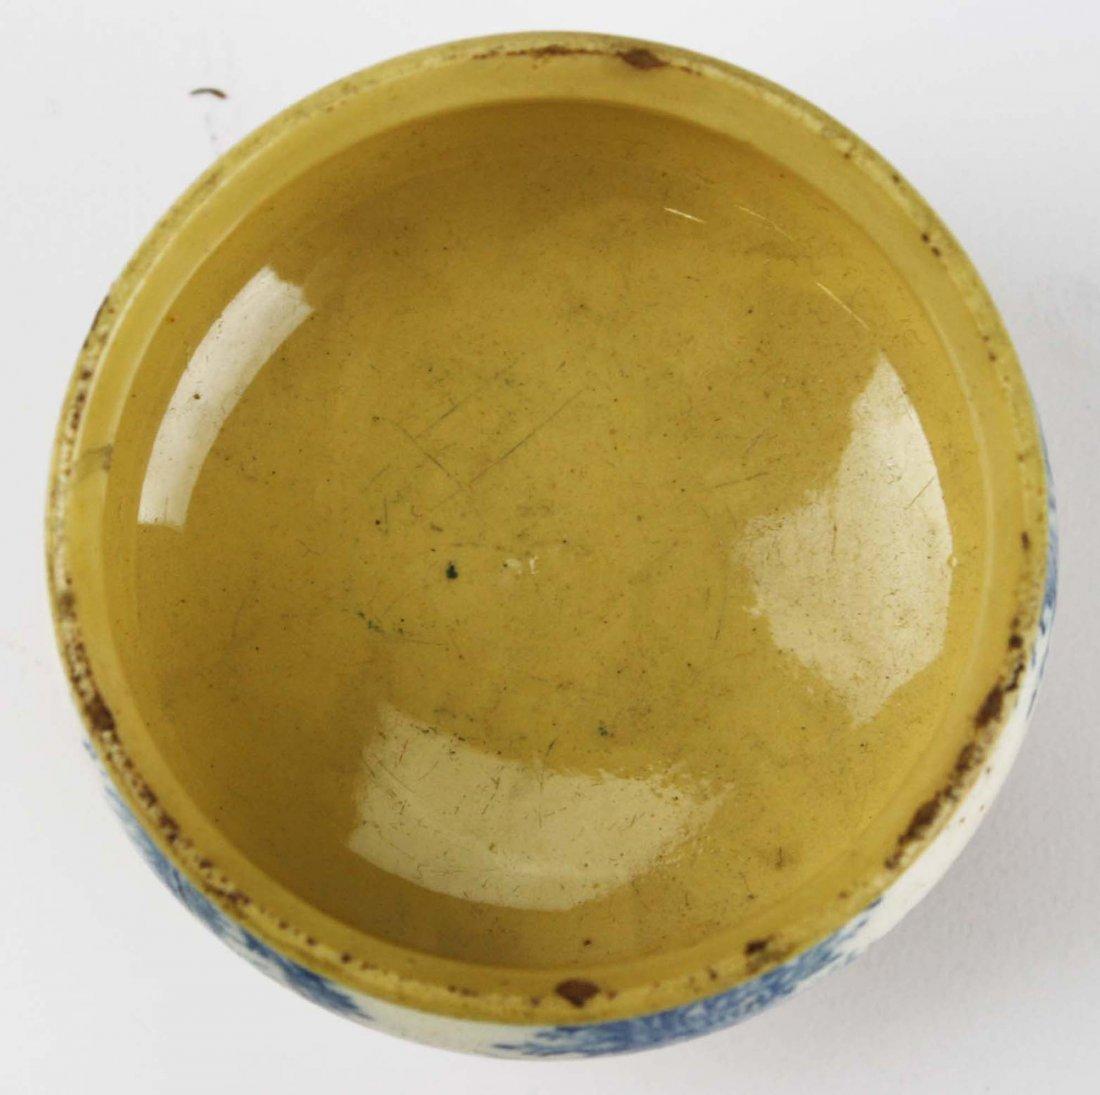 rare early 19th c mocha ware master salt with seaweed - 5